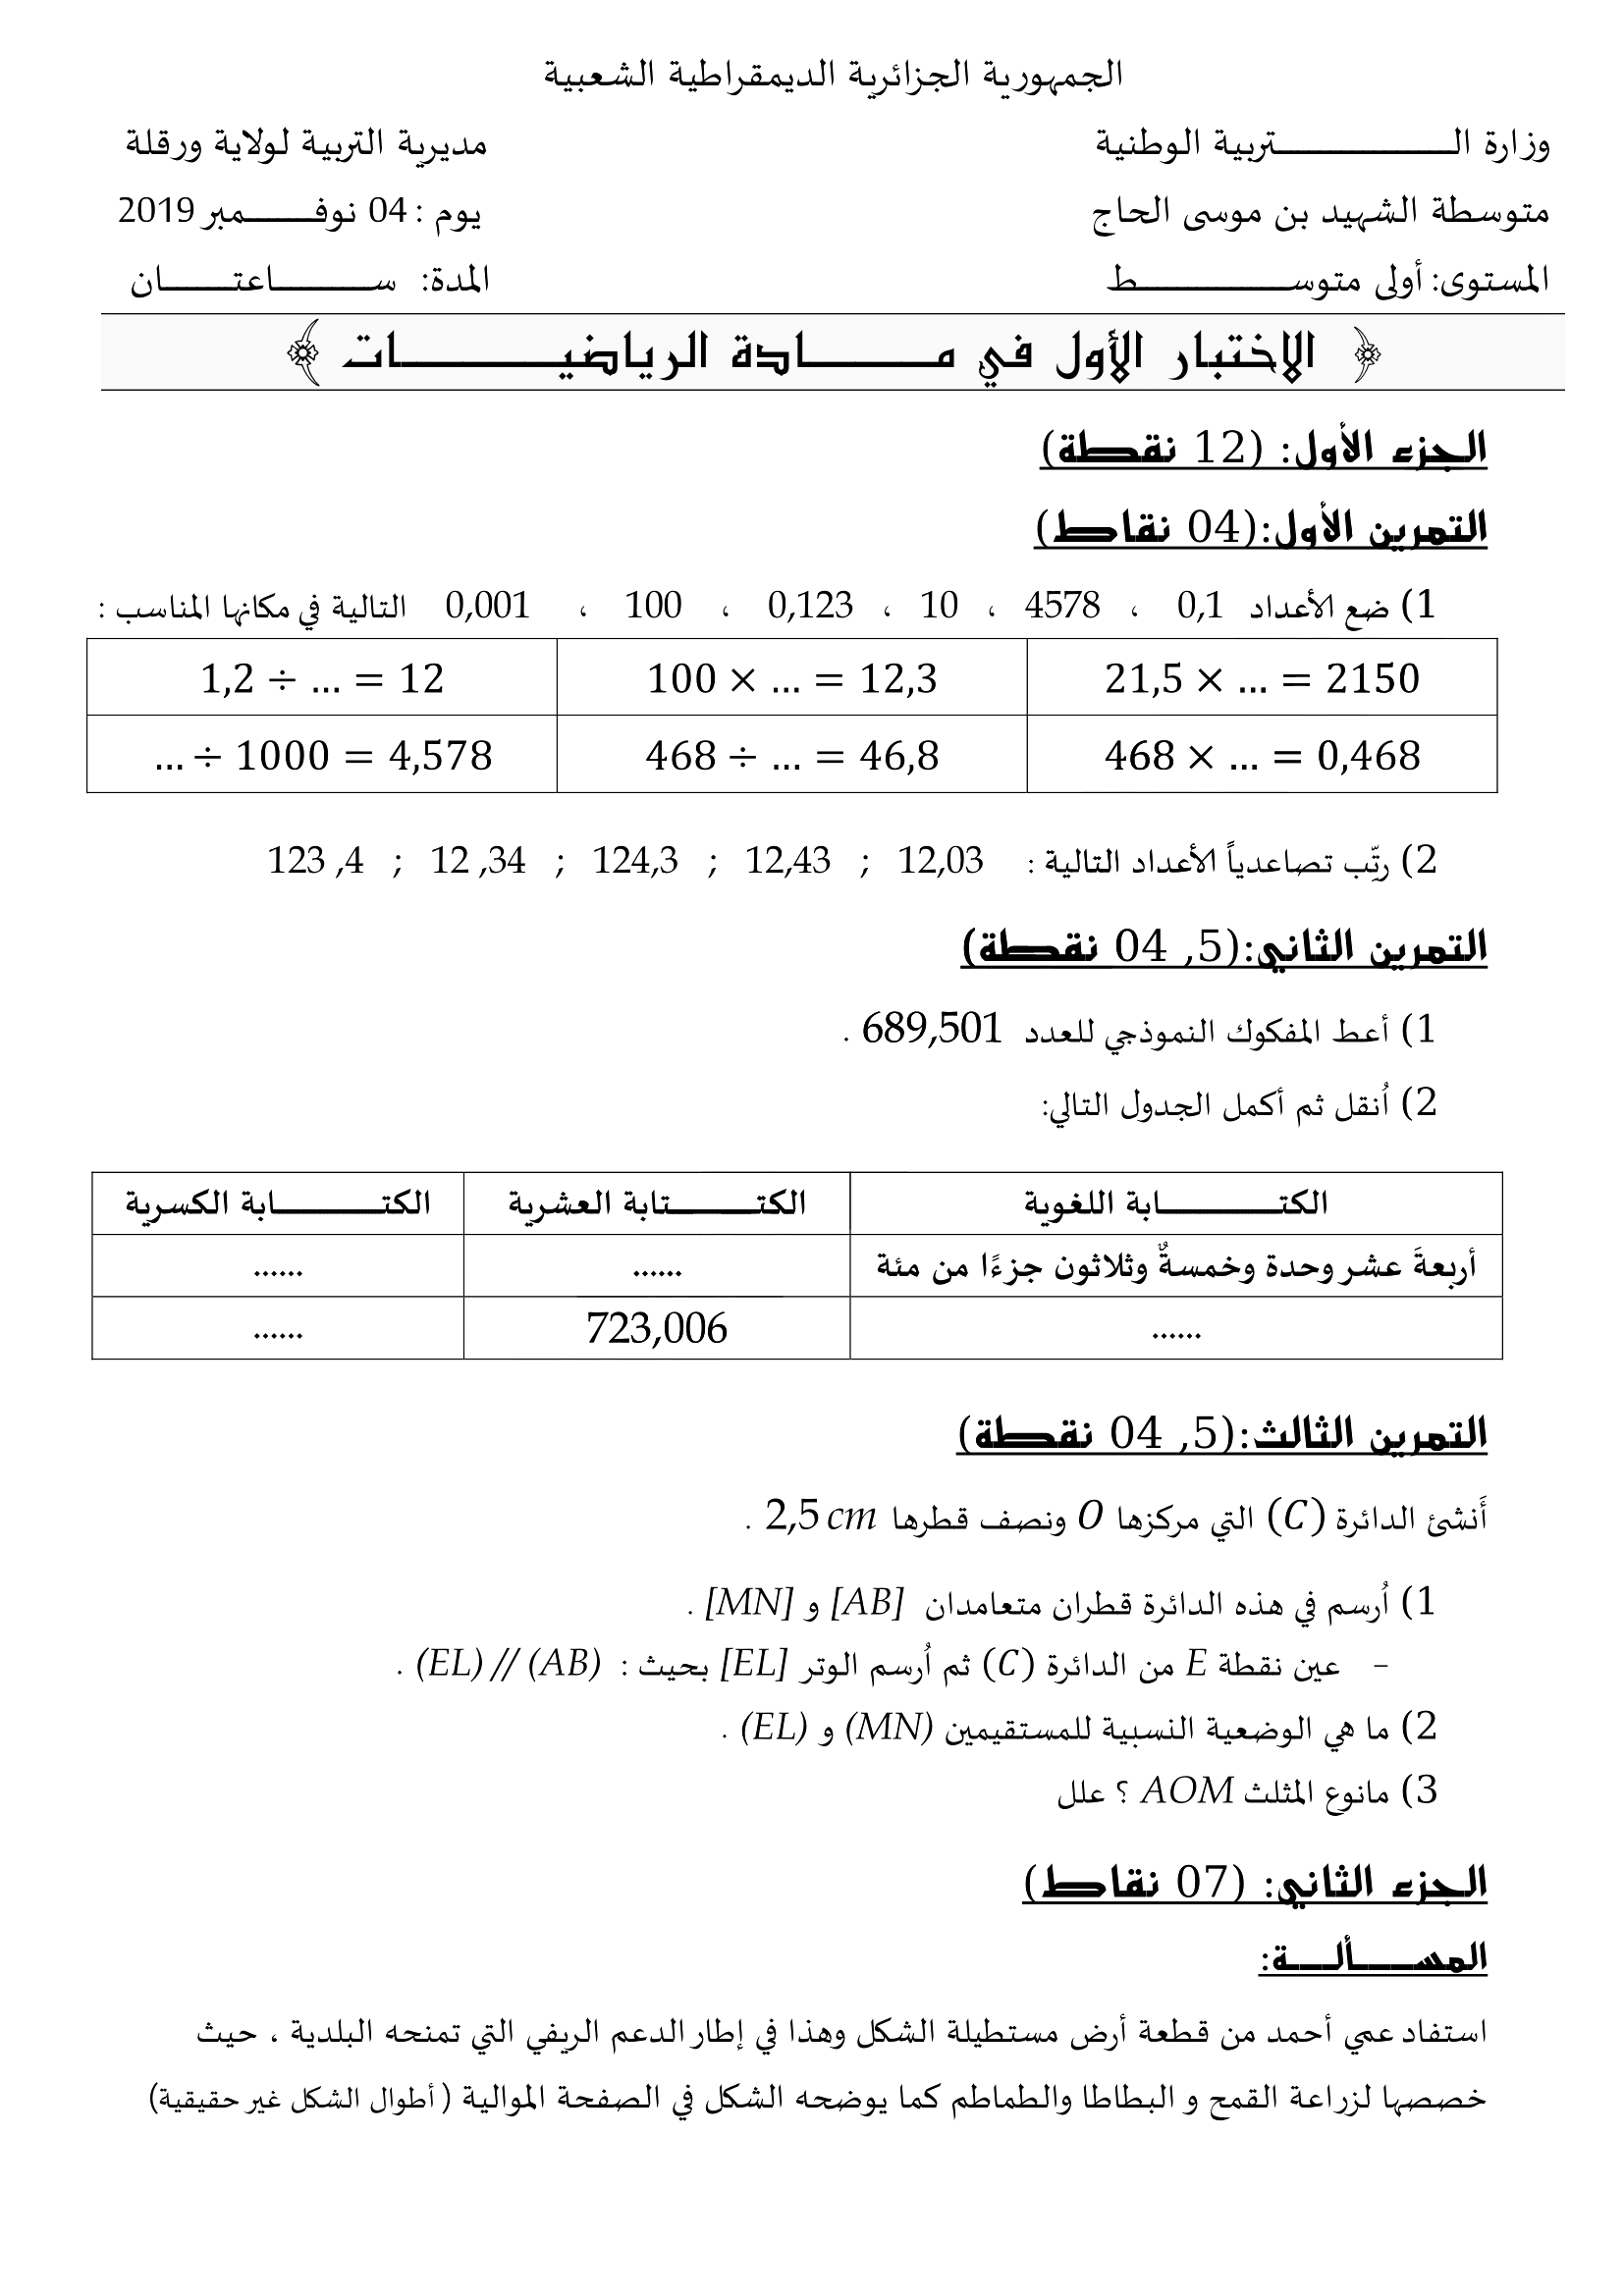 1am Exams Math فروض و اختبارات السنة أولى متوسط مادة الرياضيات الفصل الأول 2019 2020 النموذج 01 Math Exam Sheet Music